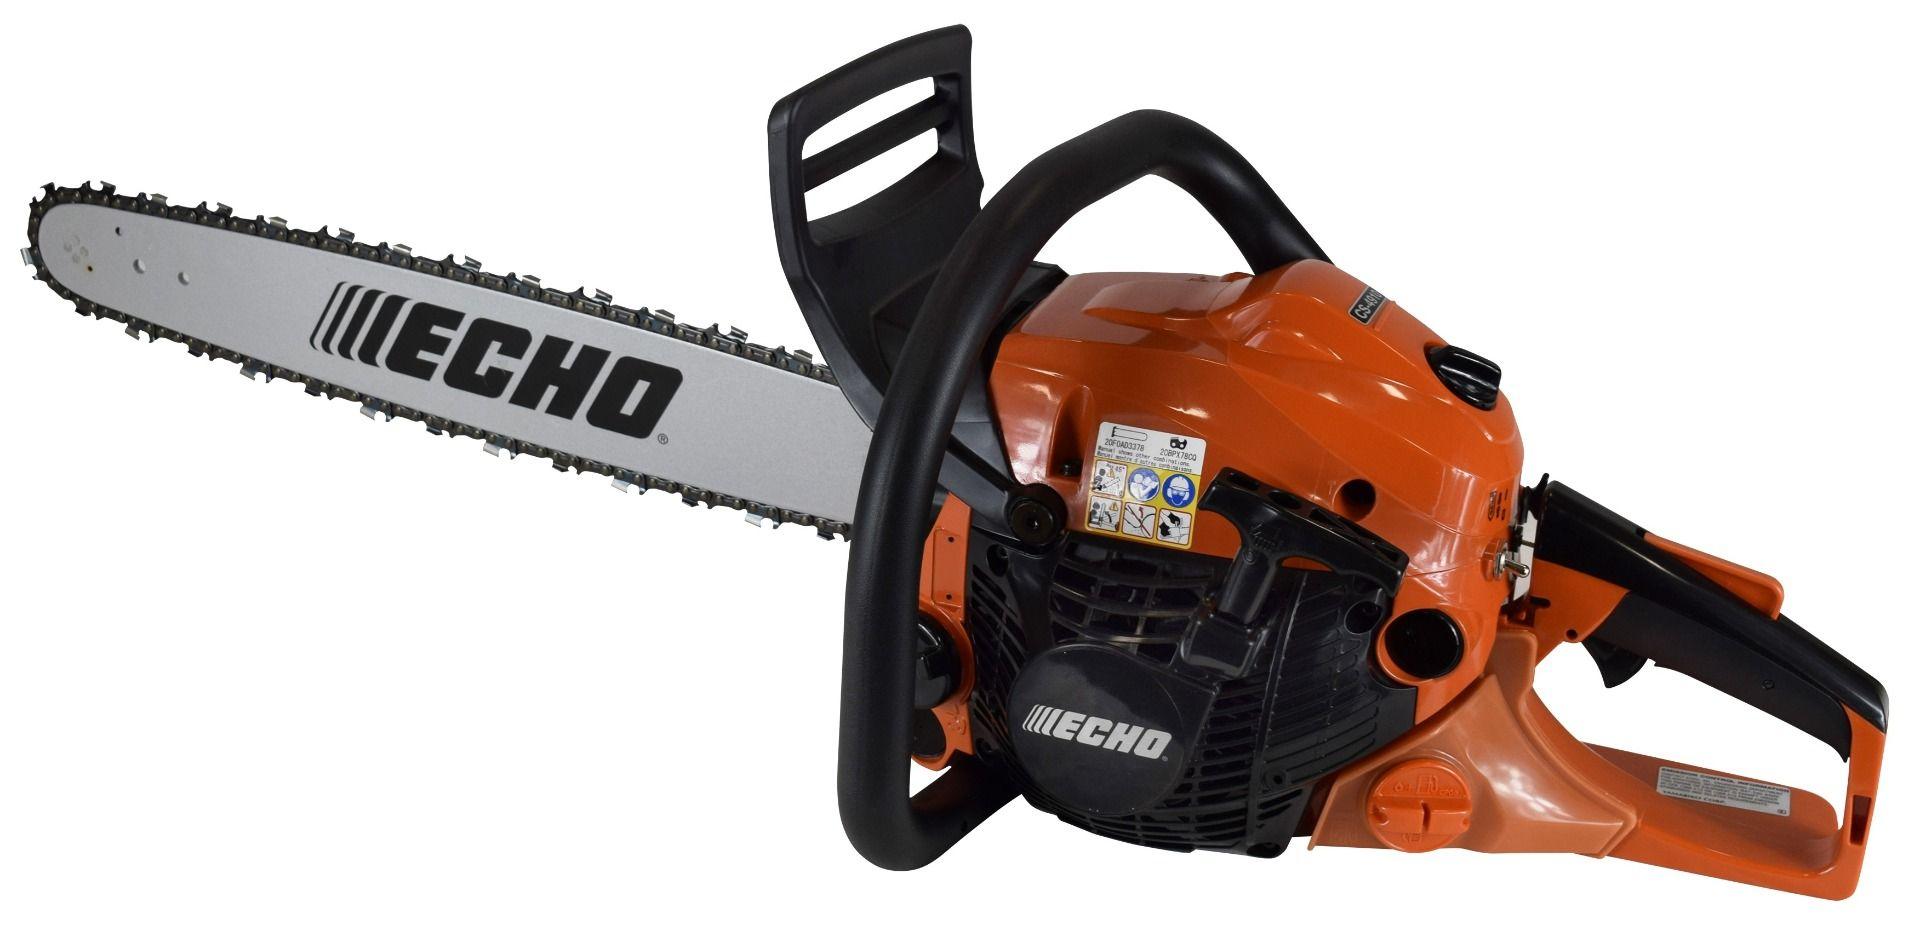 "ECHO CS-4910 Rear Handle Chainsaw with 20"" Bar"